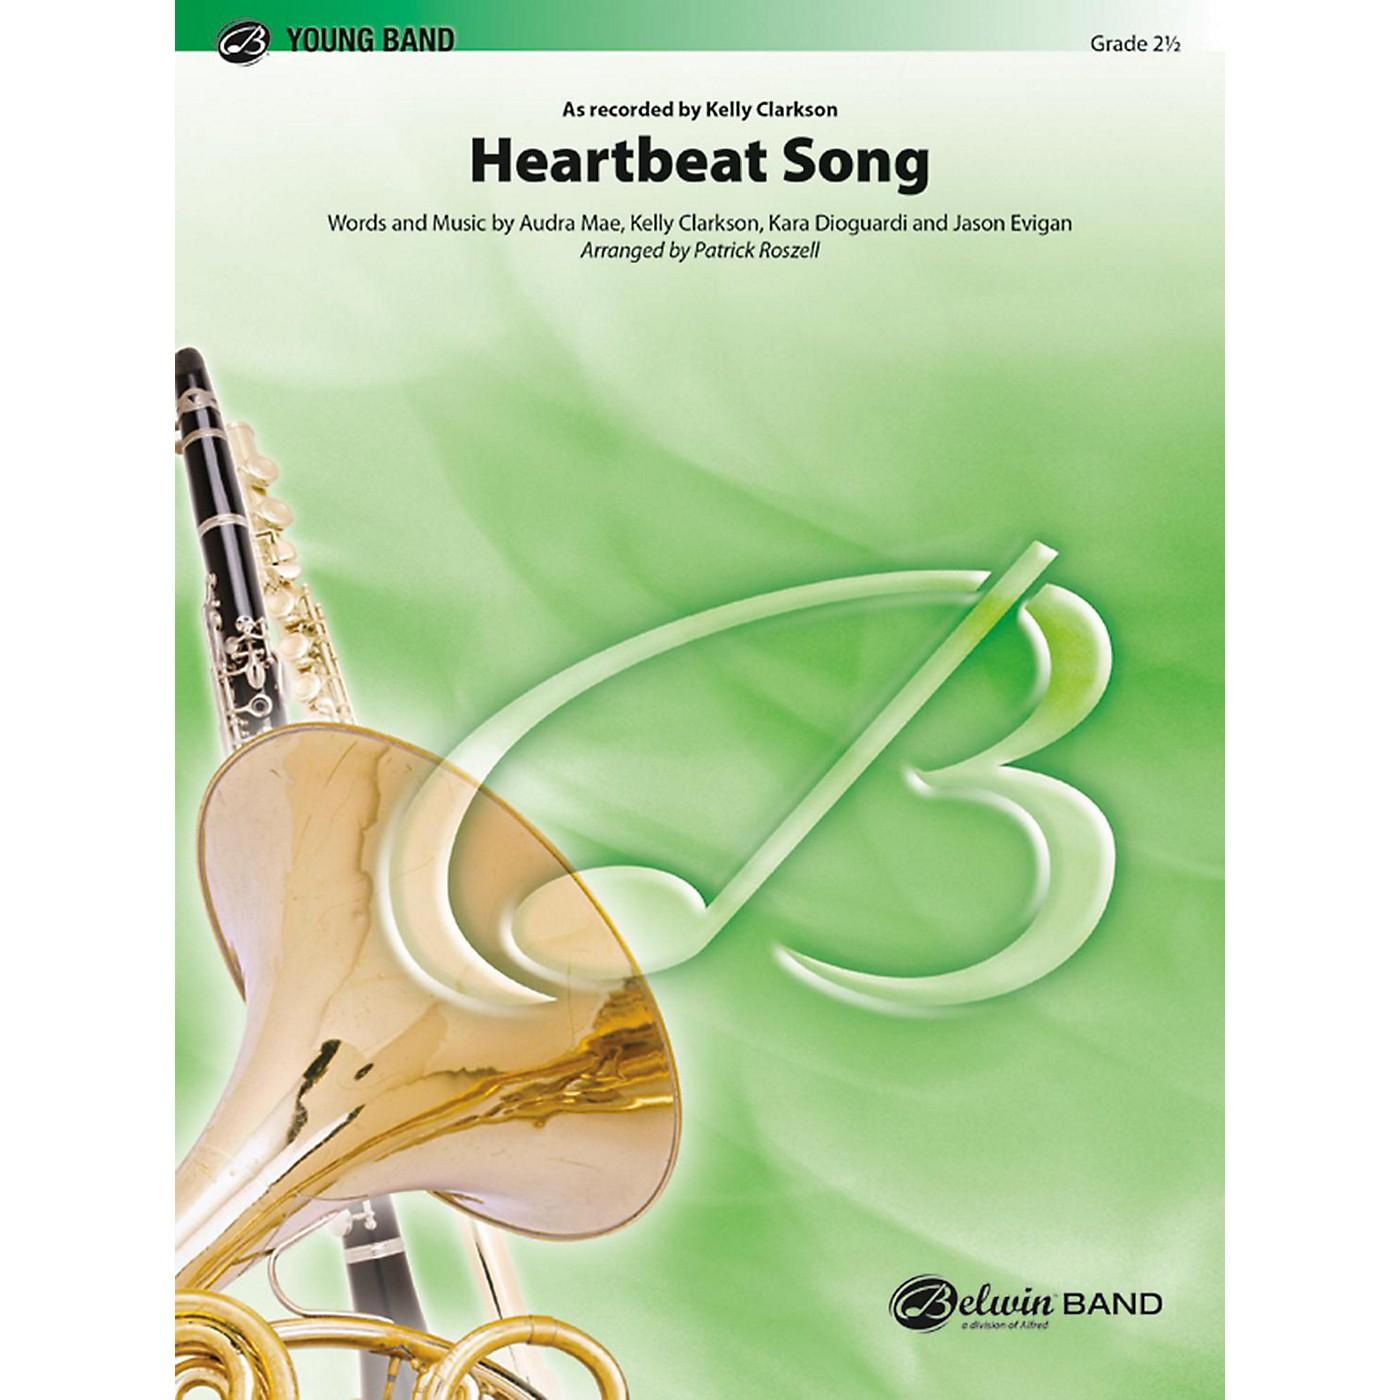 BELWIN Heartbeat Song Grade 2 (Easy) thumbnail